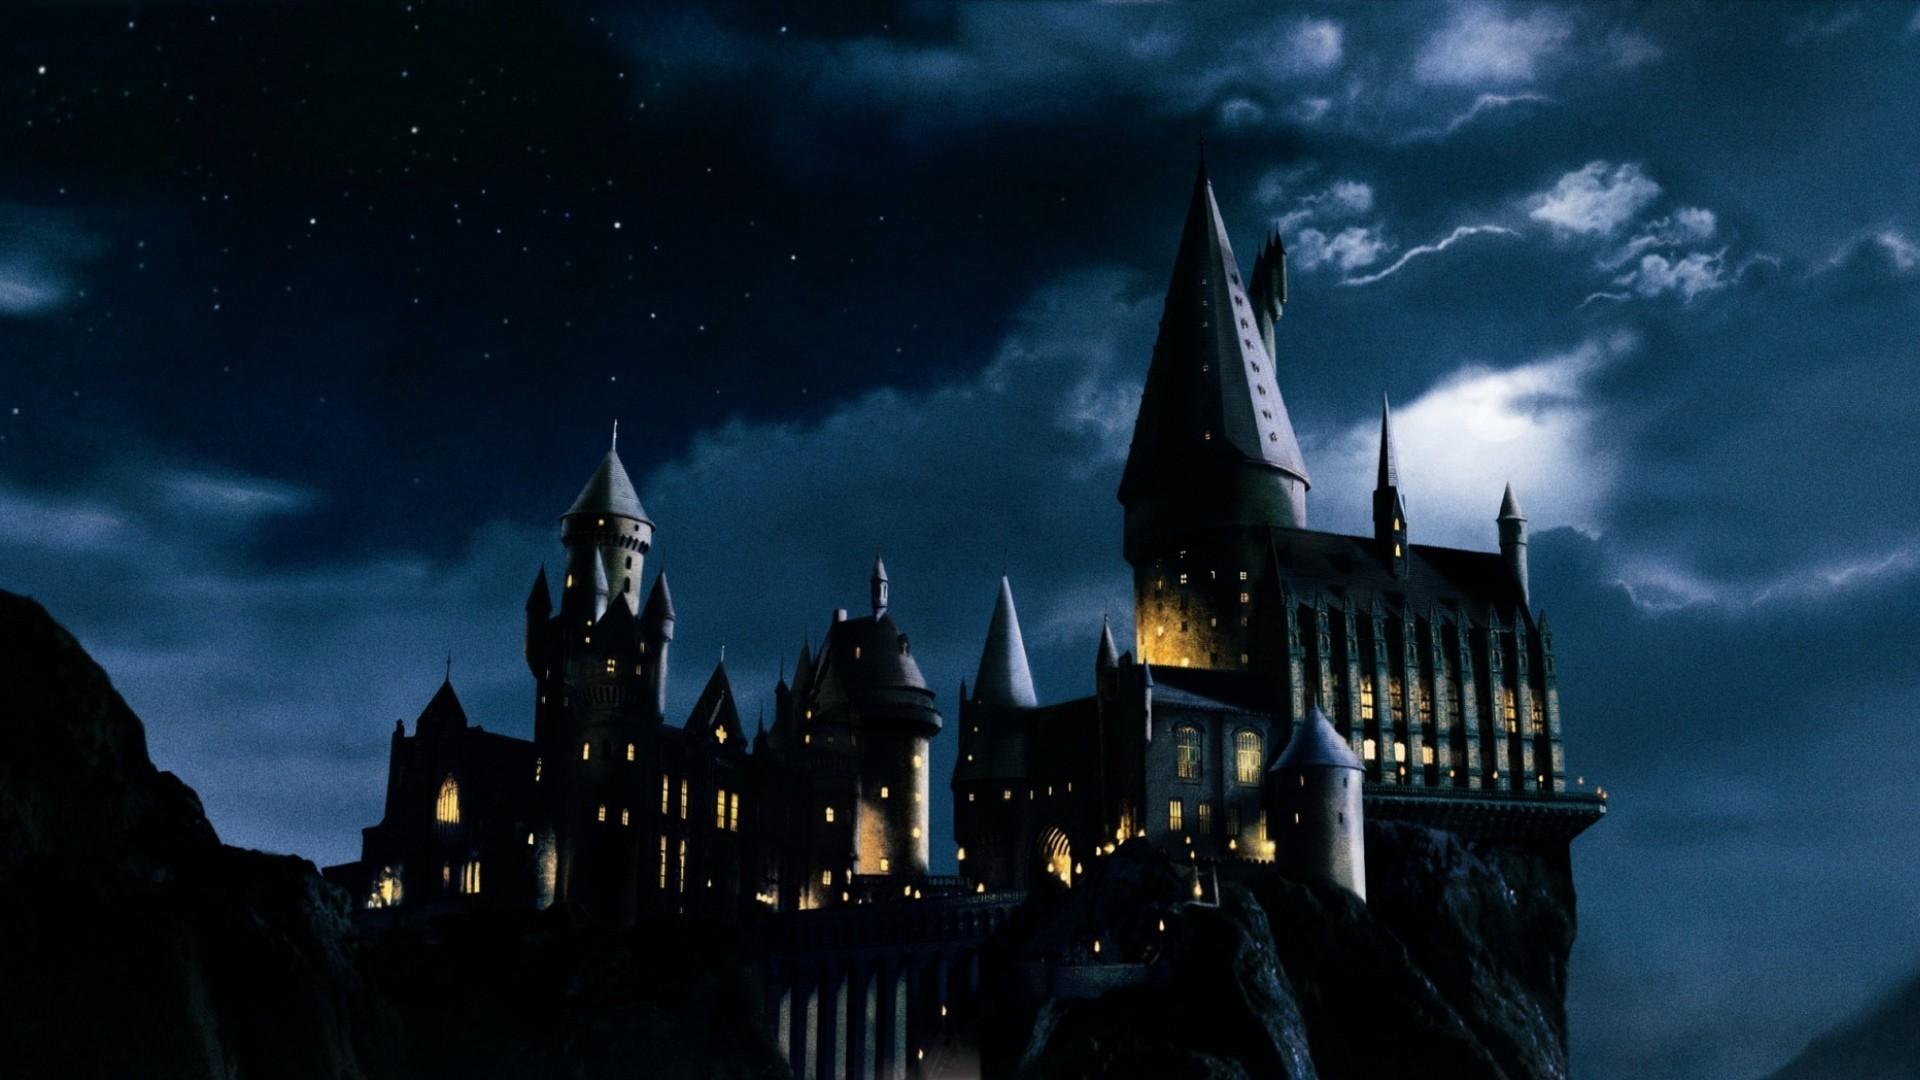 Download Wallpaper Harry Potter Tablet - 134788-harry-potter-wallpapers-1920x1080-tablet  Gallery_84957.jpg